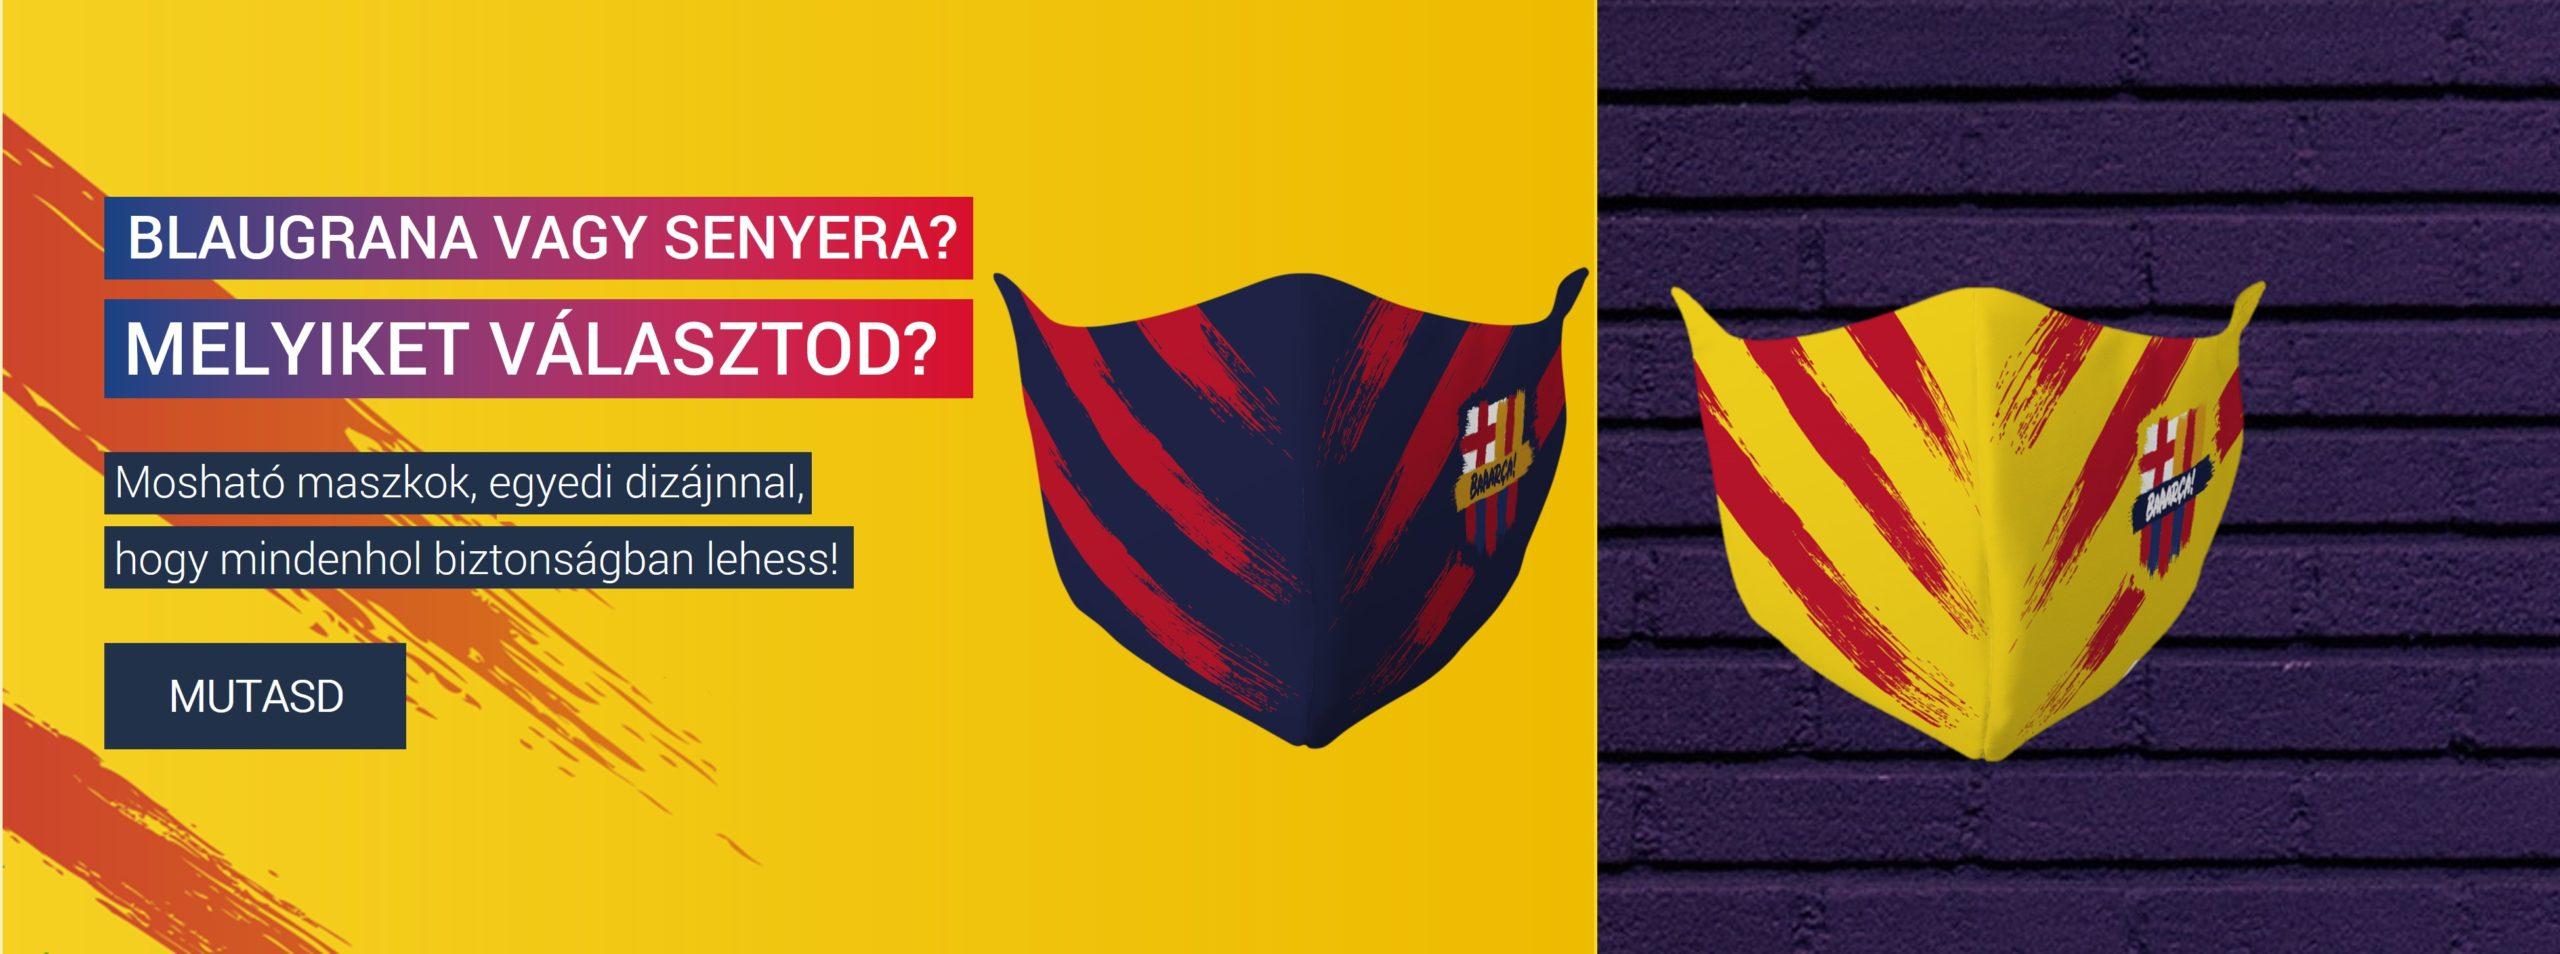 barcelona maszk